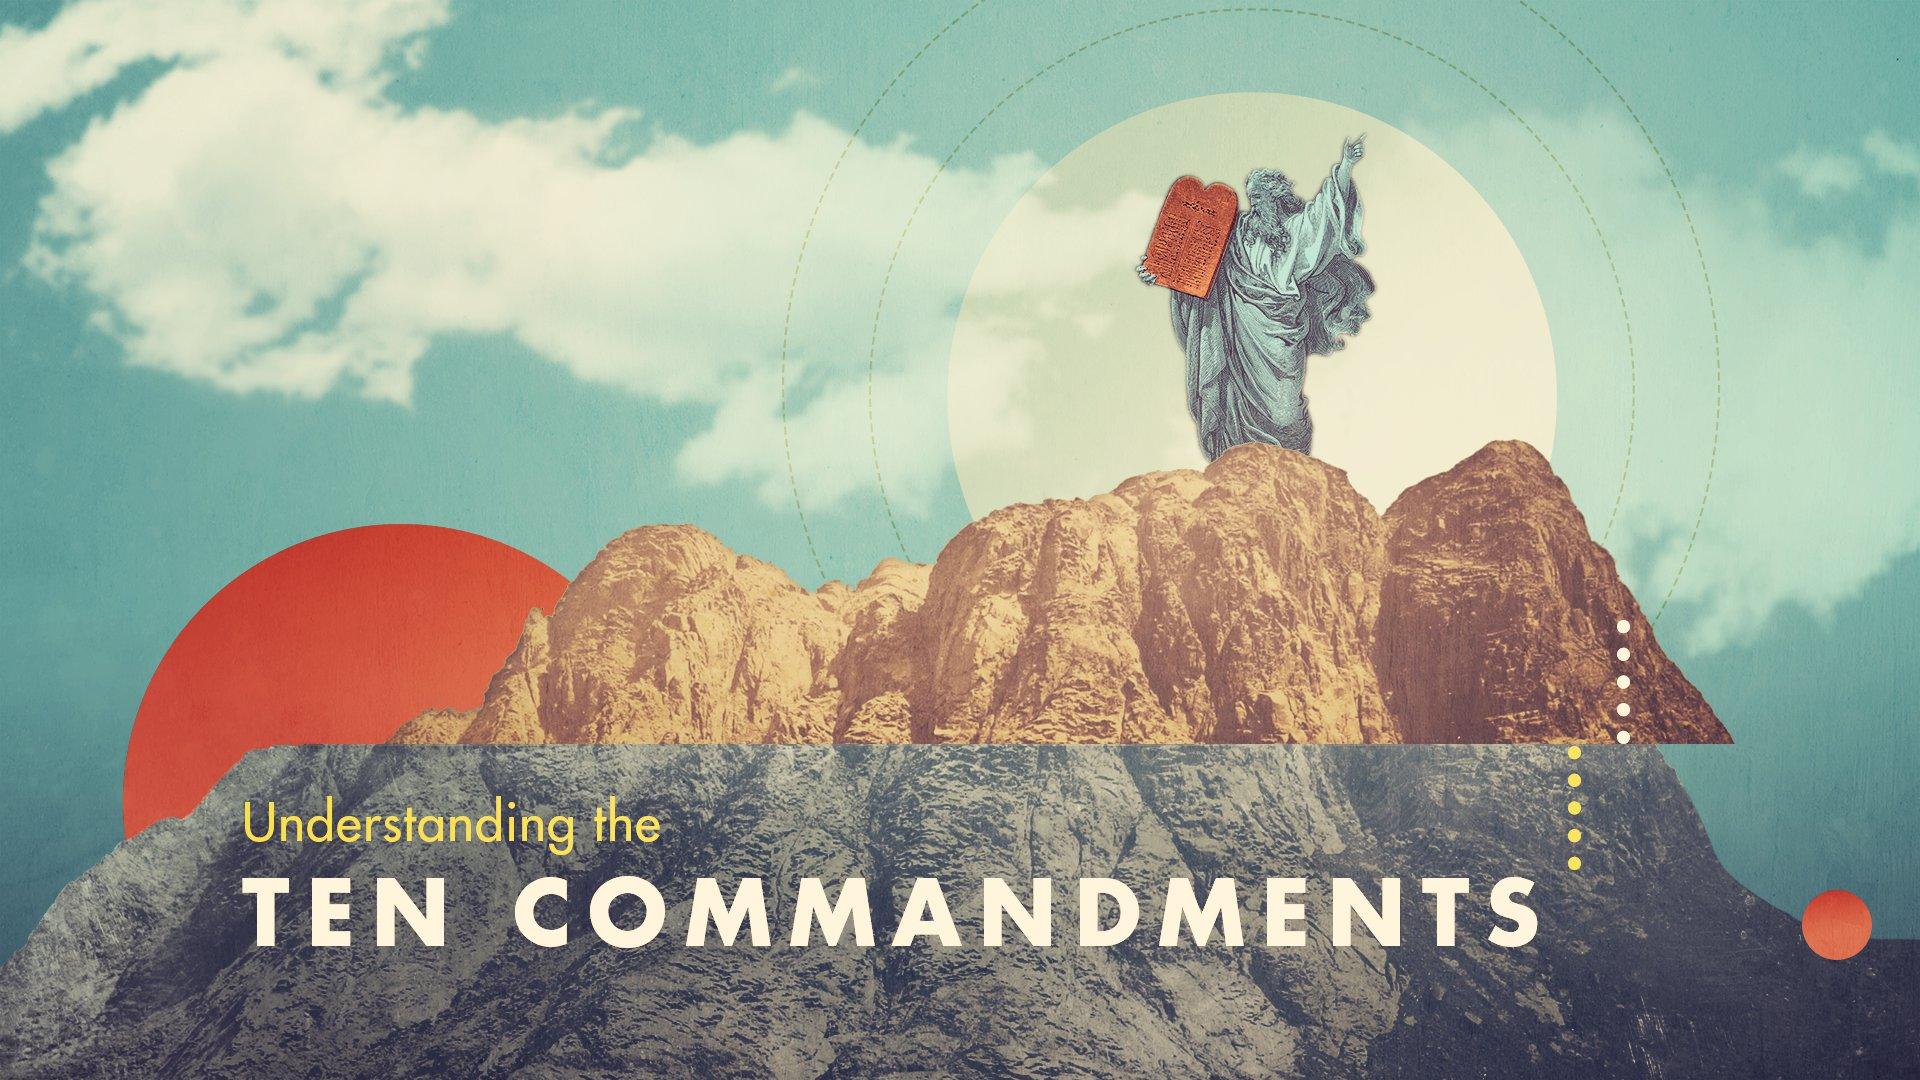 Understanding-The-Ten-Commandments_Jim-LePage.jpg